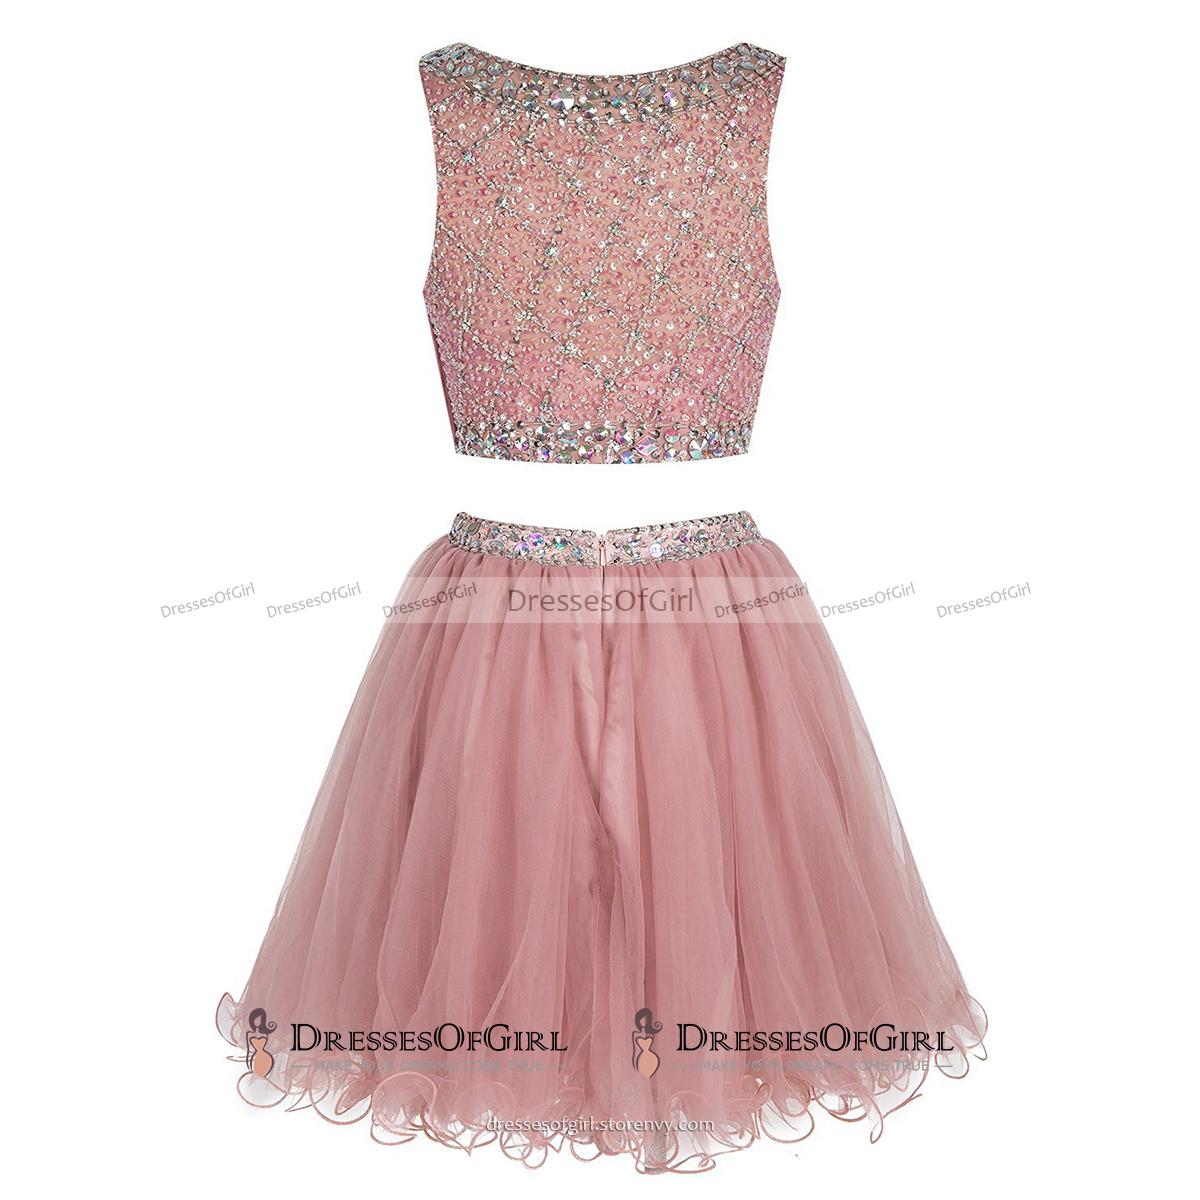 75e48645f74 Bateau Neck Illusion Pink Short Prom Dress